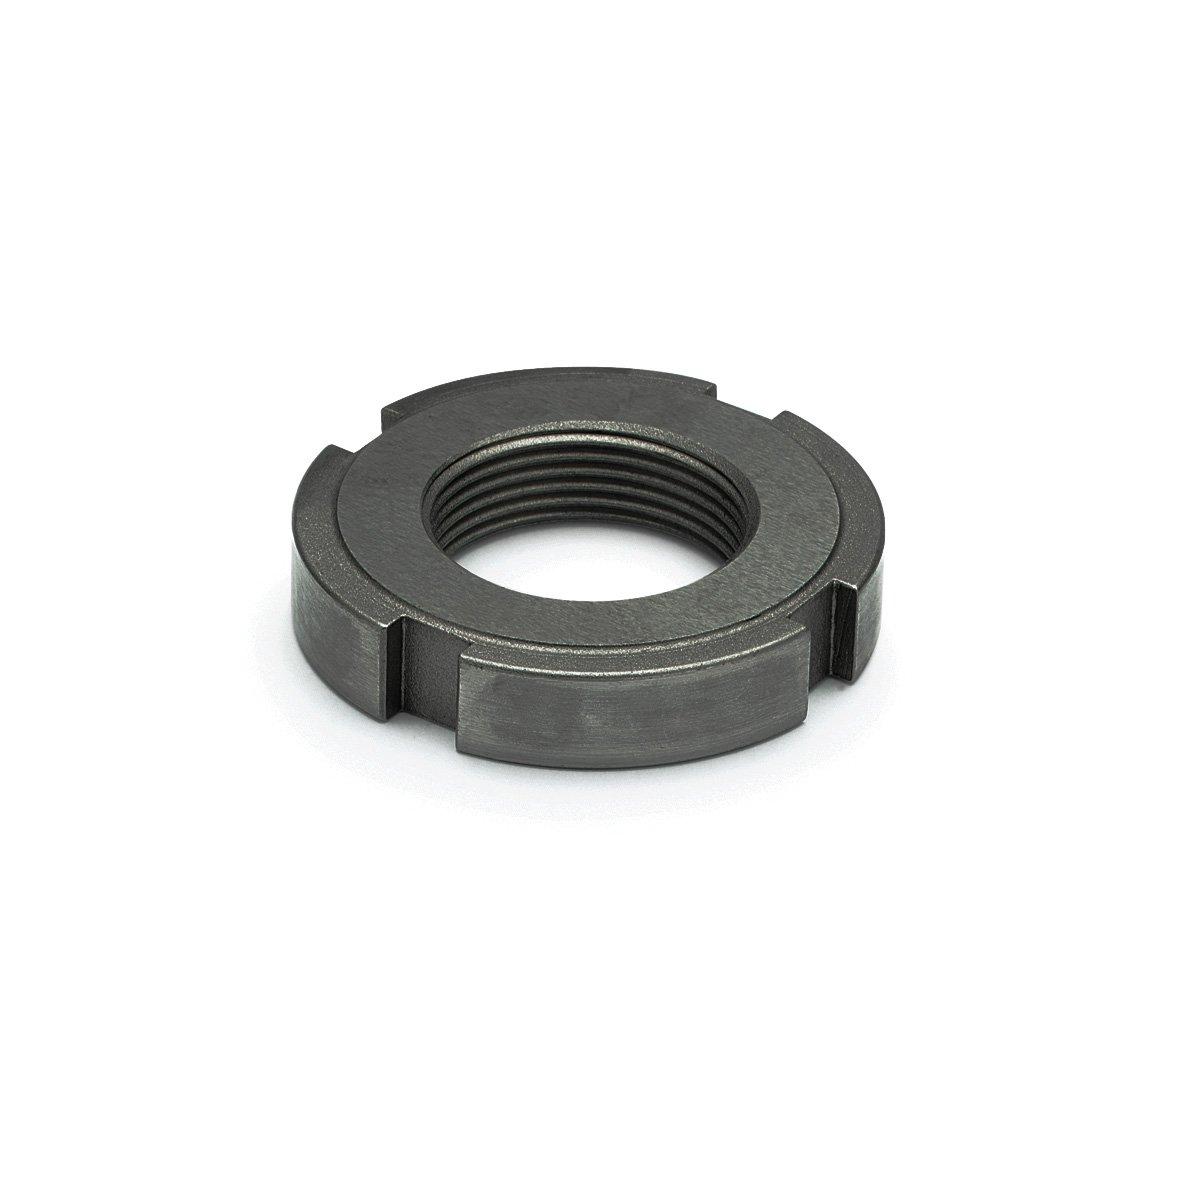 J.W. Winco 380XSNB DIN1804 Slotted Spanner Nut, M38 x 1.5 mm, Steel by JW Winco